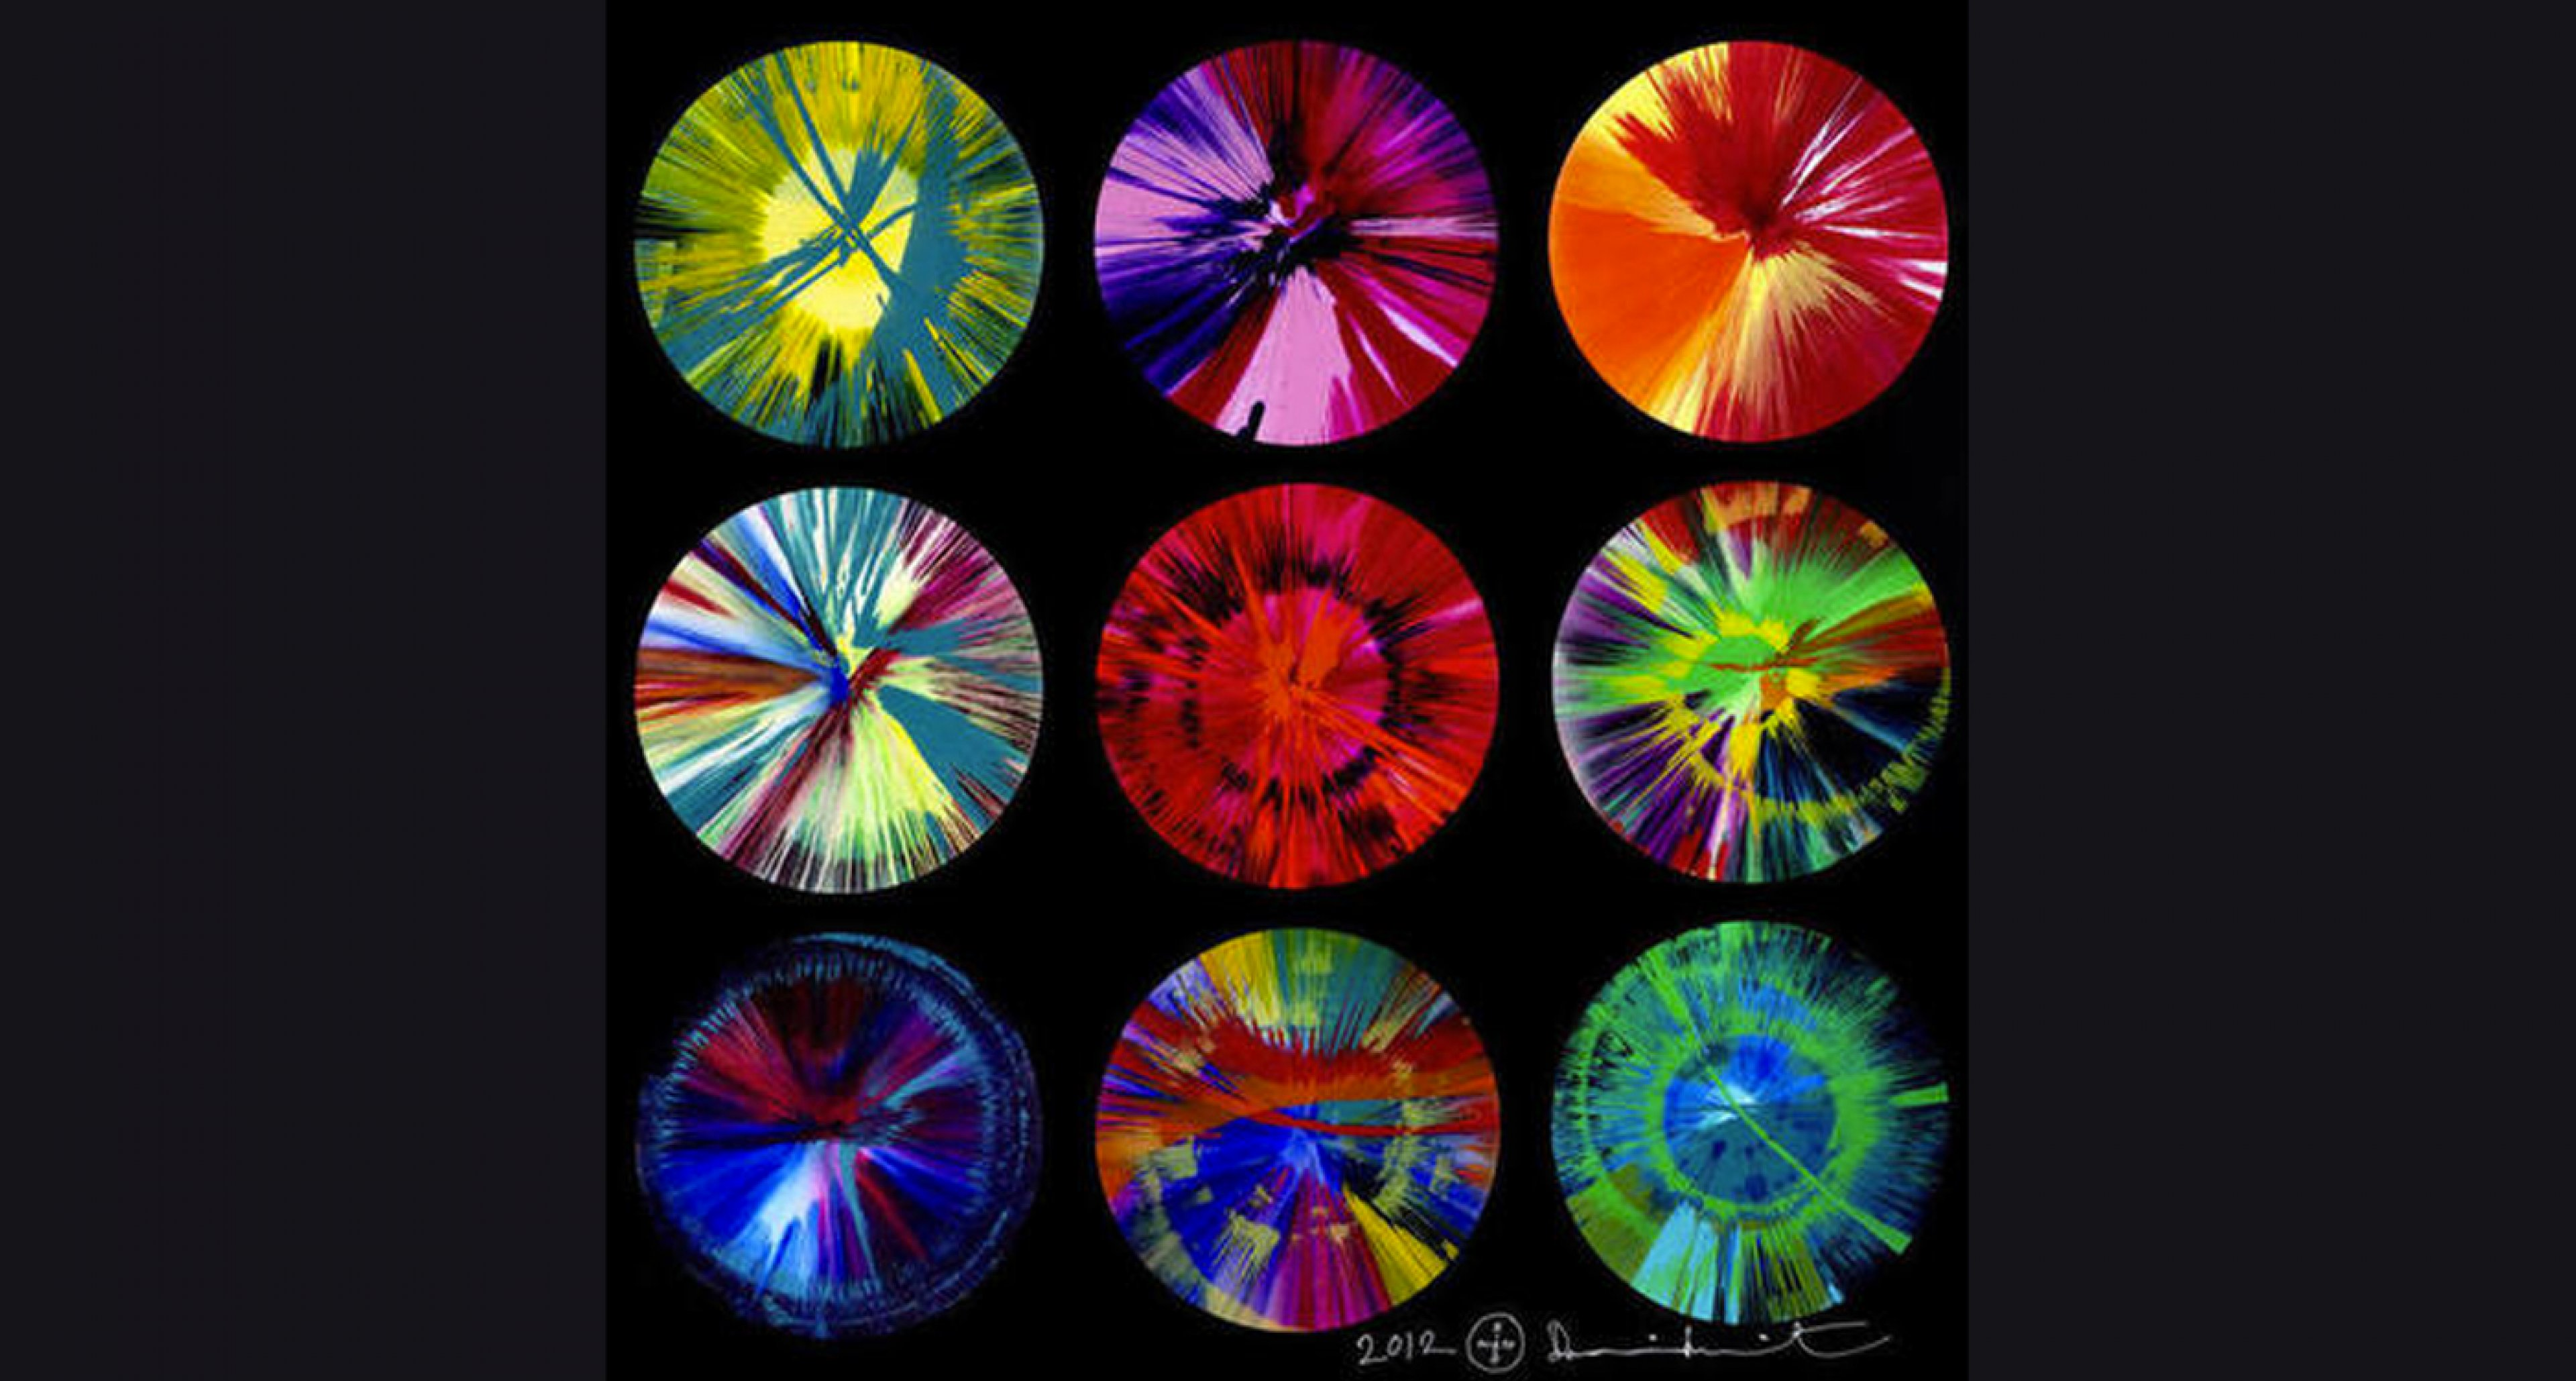 Damien Hirst, 'Beautiful Intergalactic Fantasmagoria in a Rainbow Big Bang Explosion, Let's Have More Intercourse' Charity Painting, estimate £60,000 - 80,000.